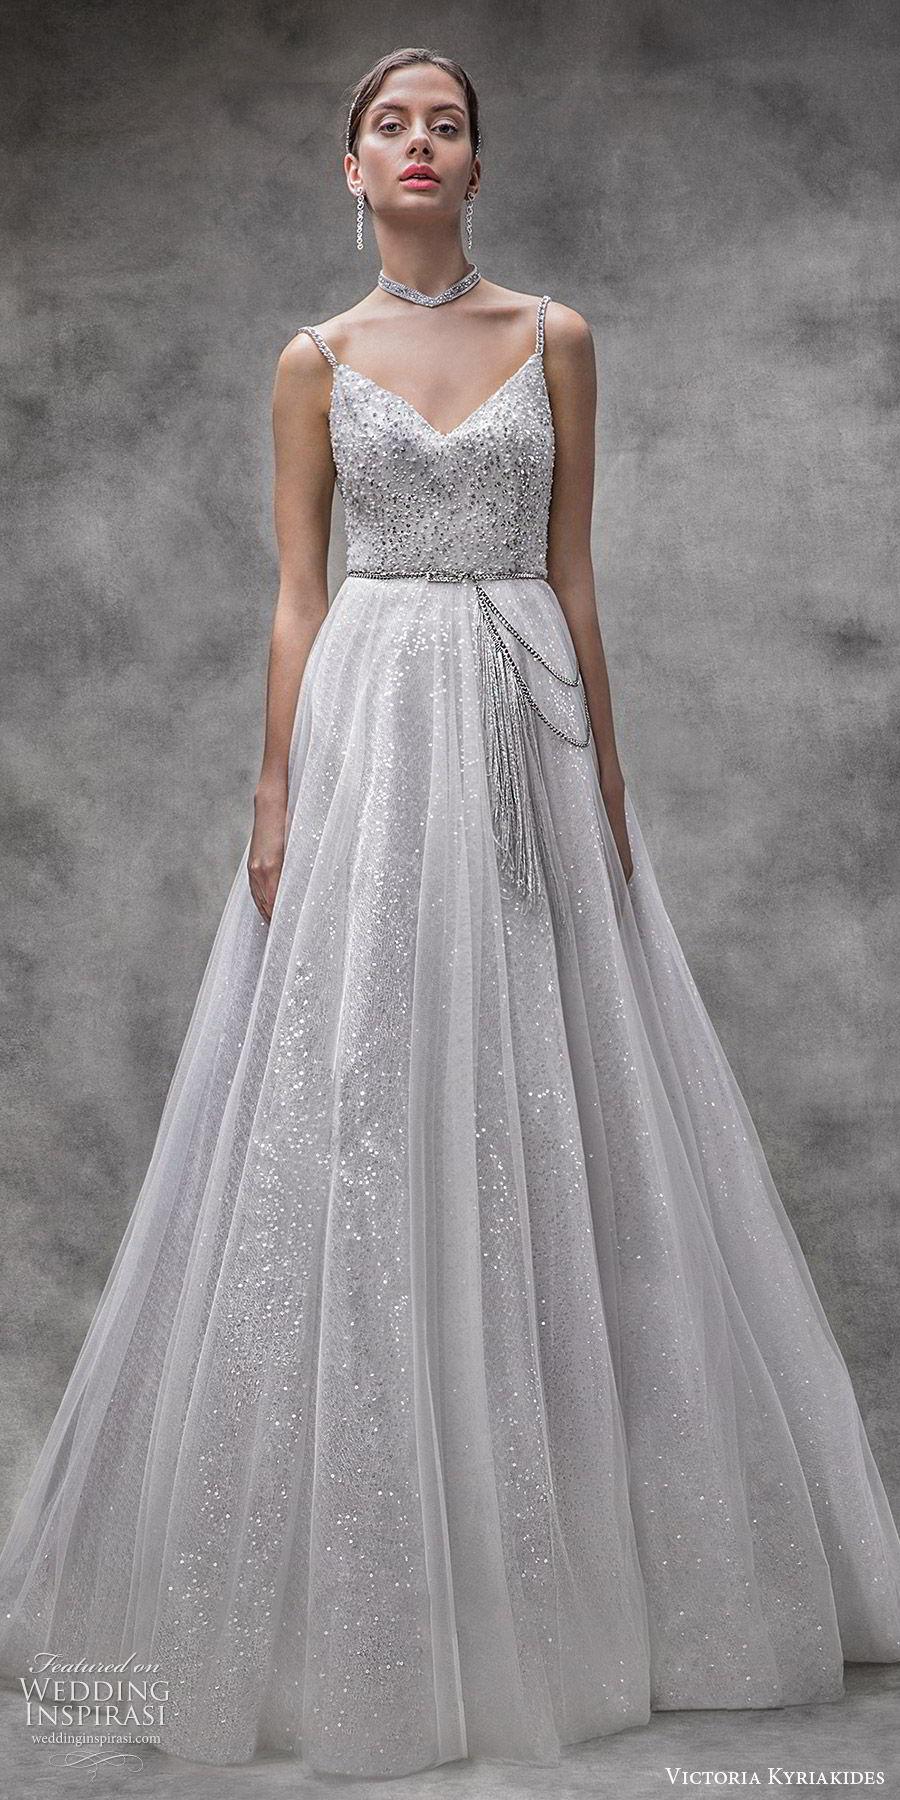 victoria kyriakides spring 2020 bridal sleeveless beaded straps v neck fully embellished a line ball gown wedding dress (11) glitzy romantic glam modern metallic mv